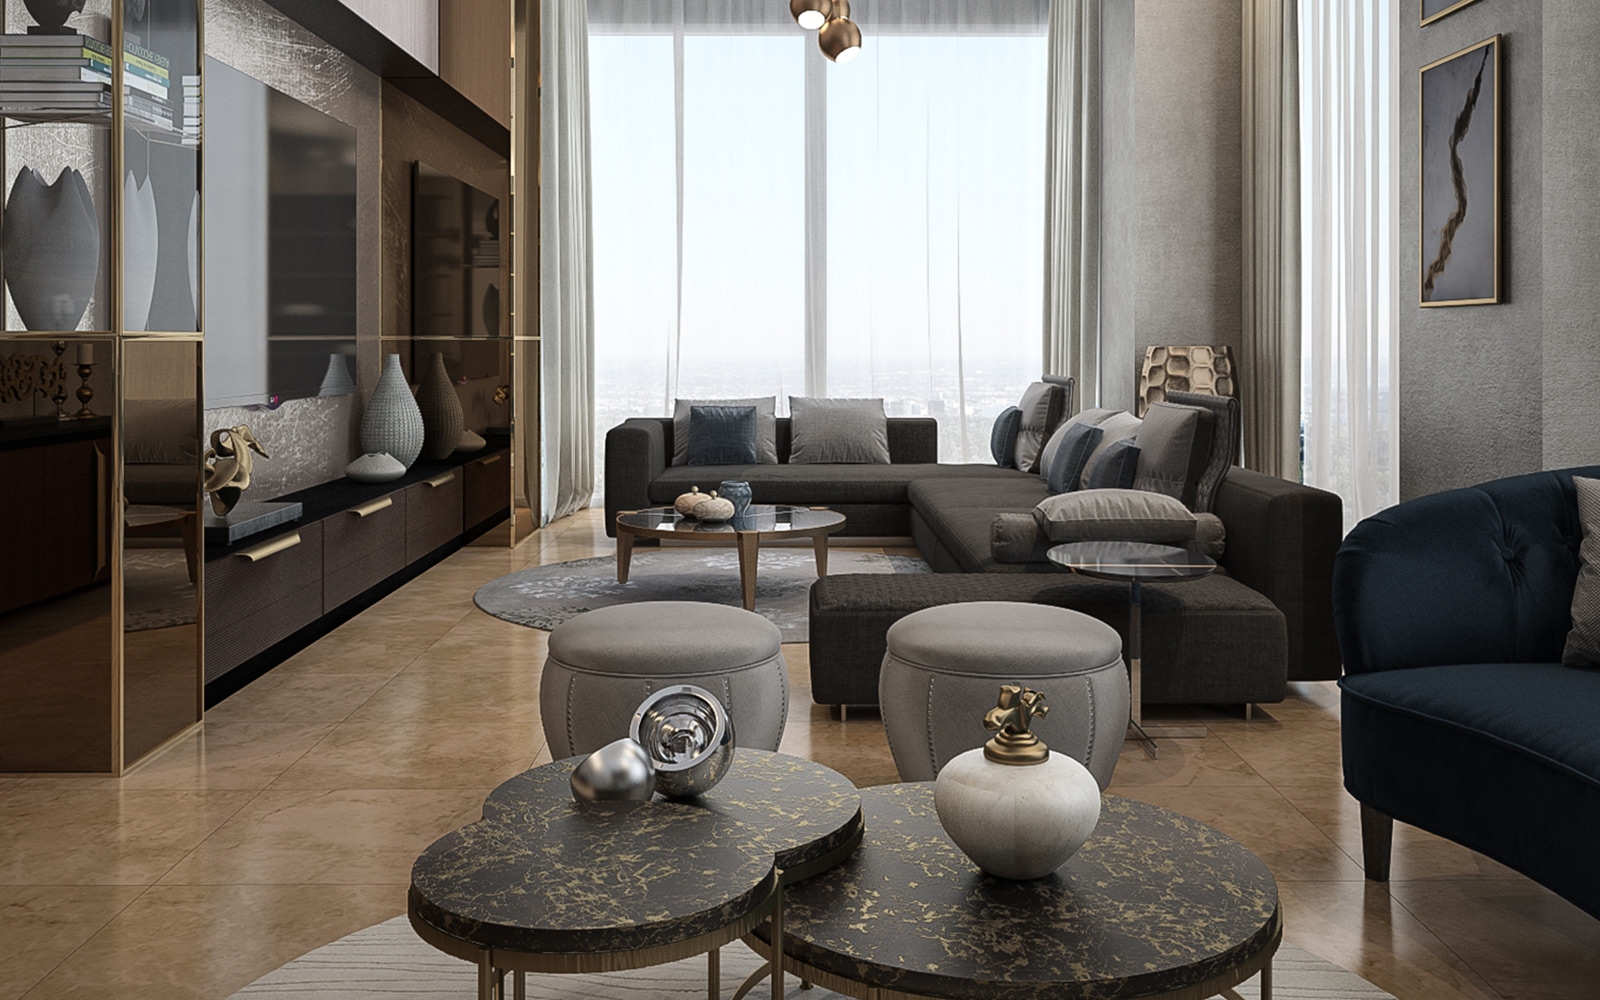 Vogue Design - Istanbul Basaksehir Flat2